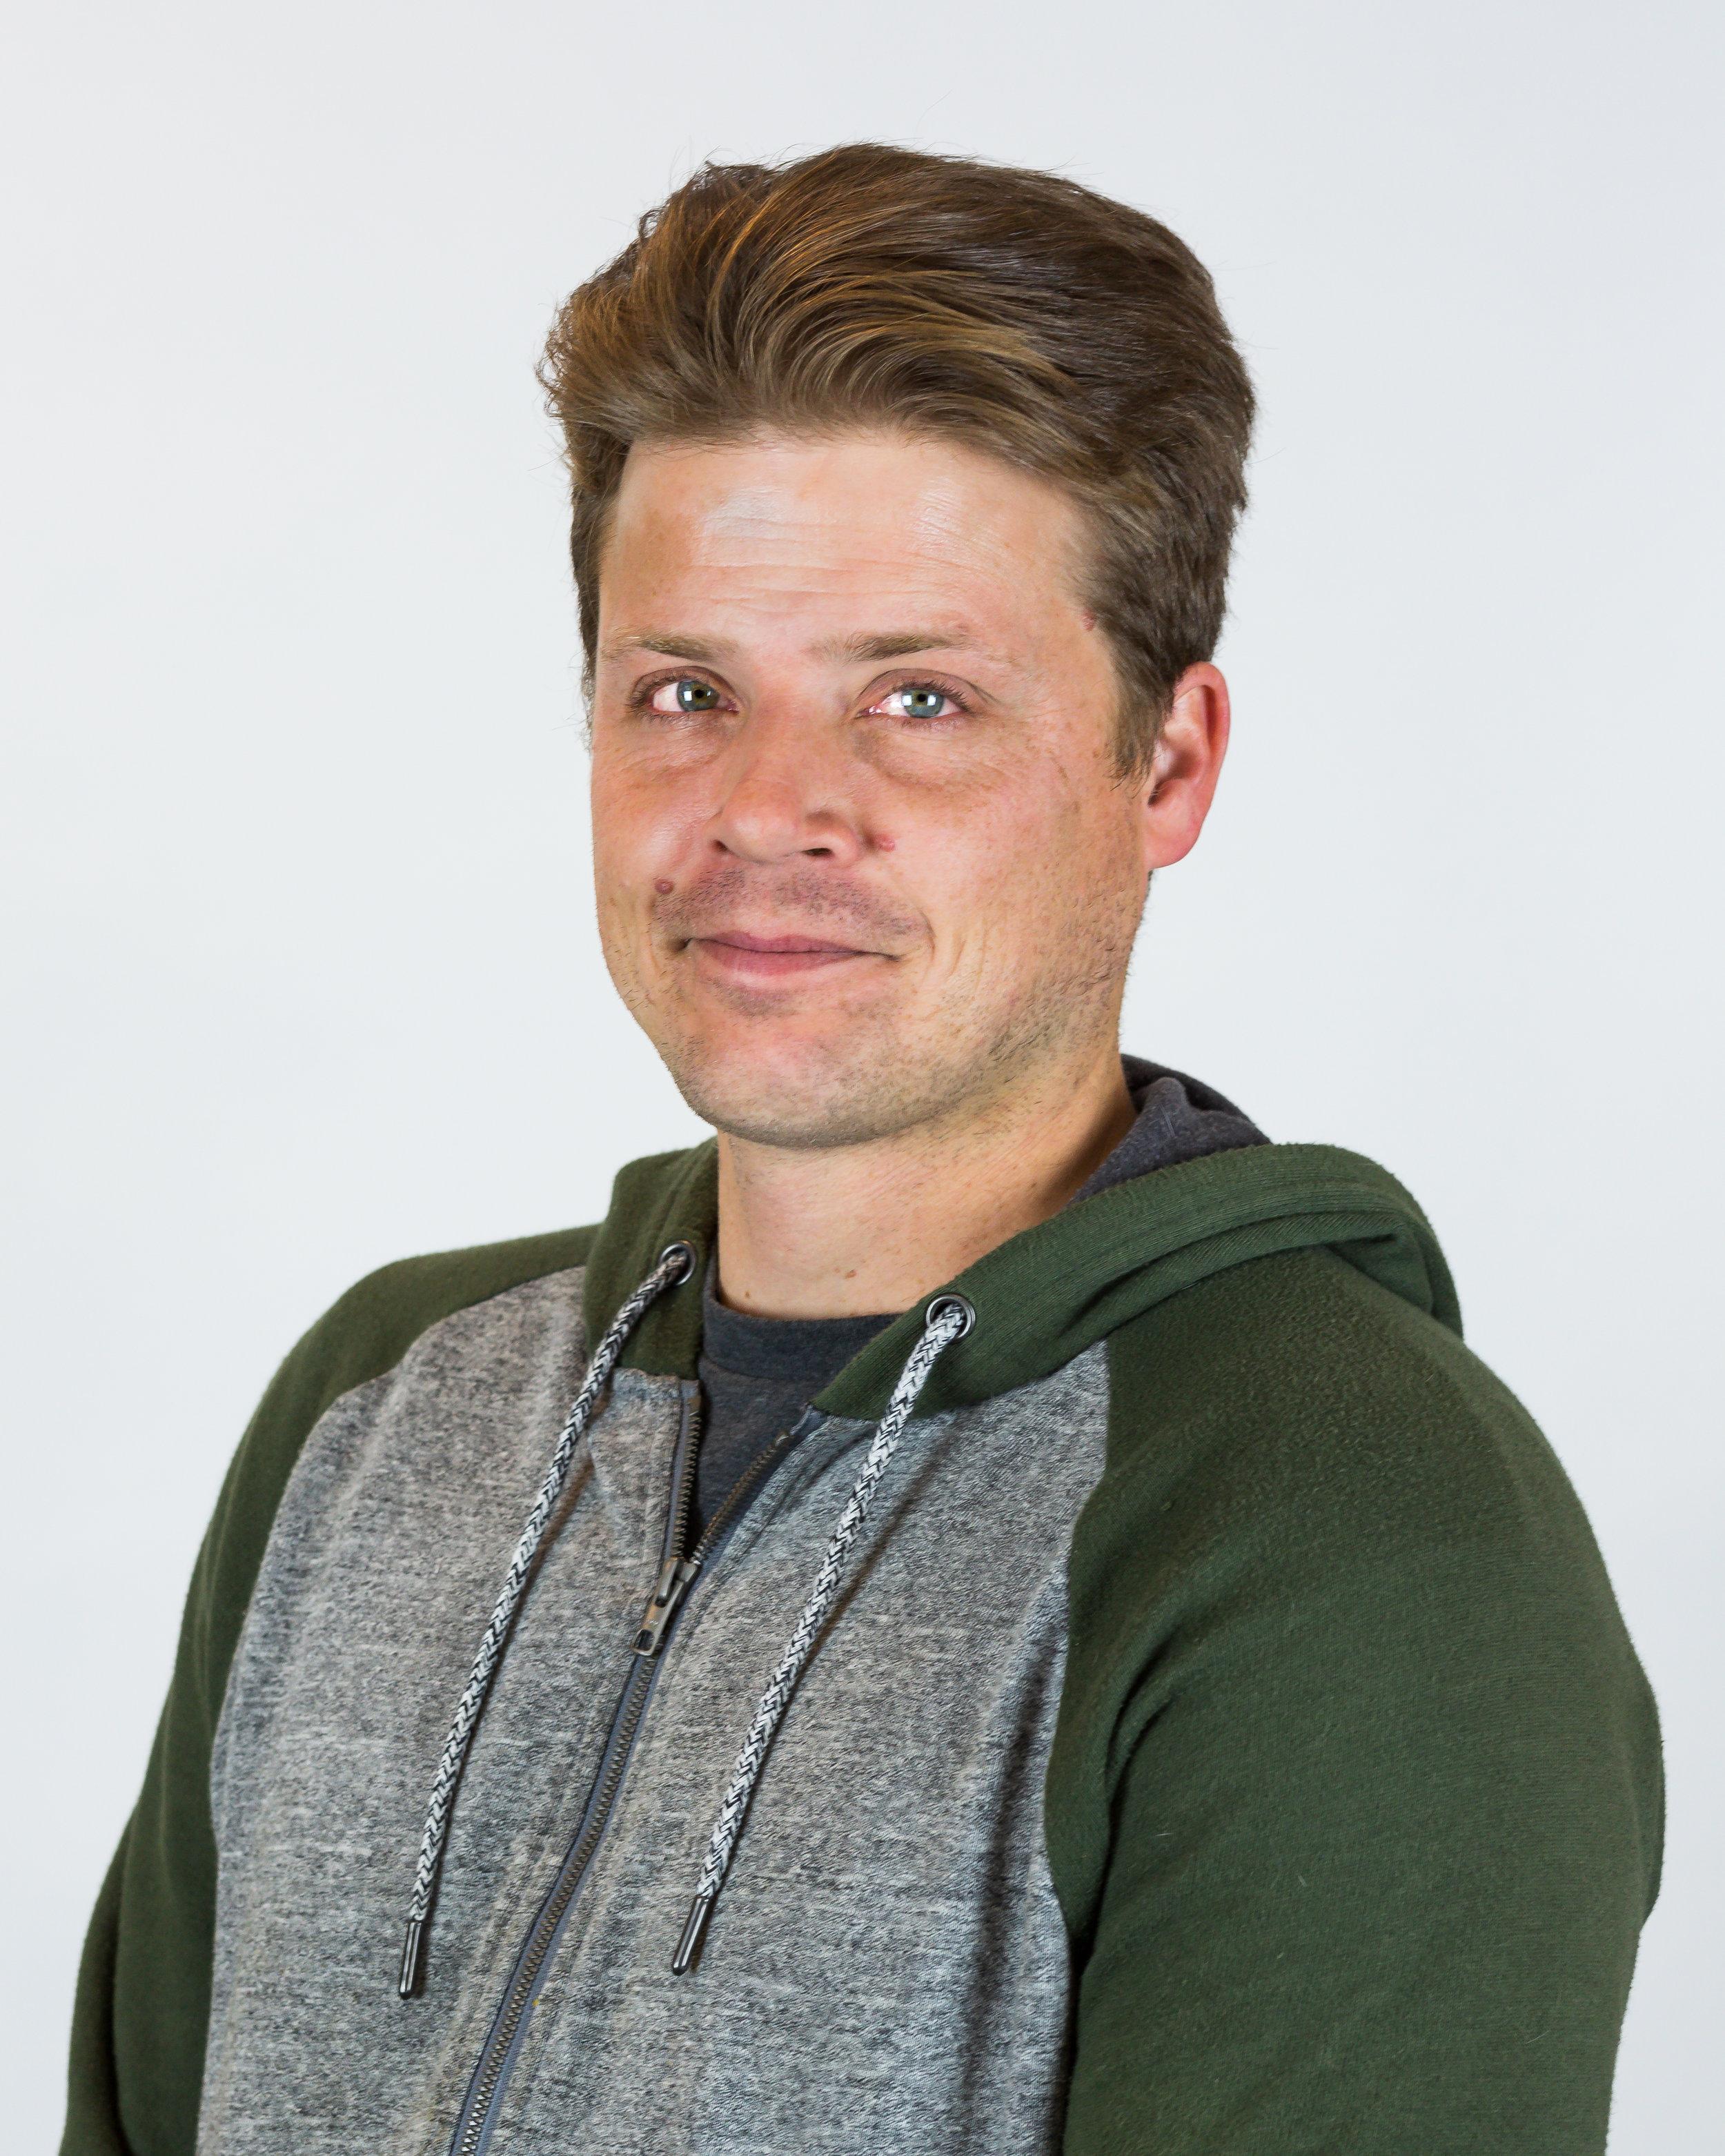 Mike Machuga: Maintenance